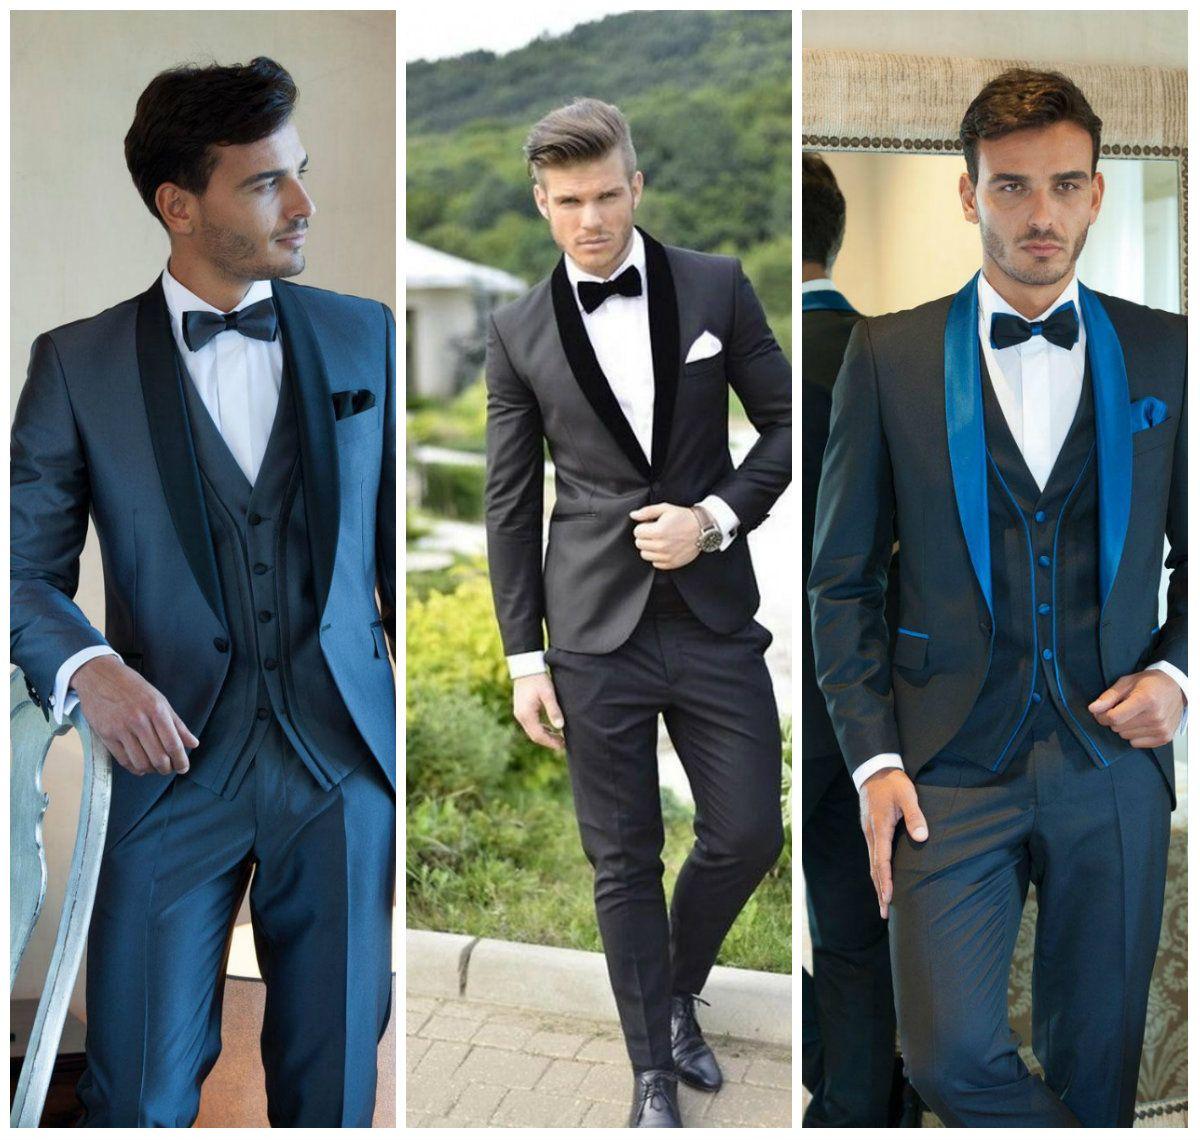 men tuxedo suit